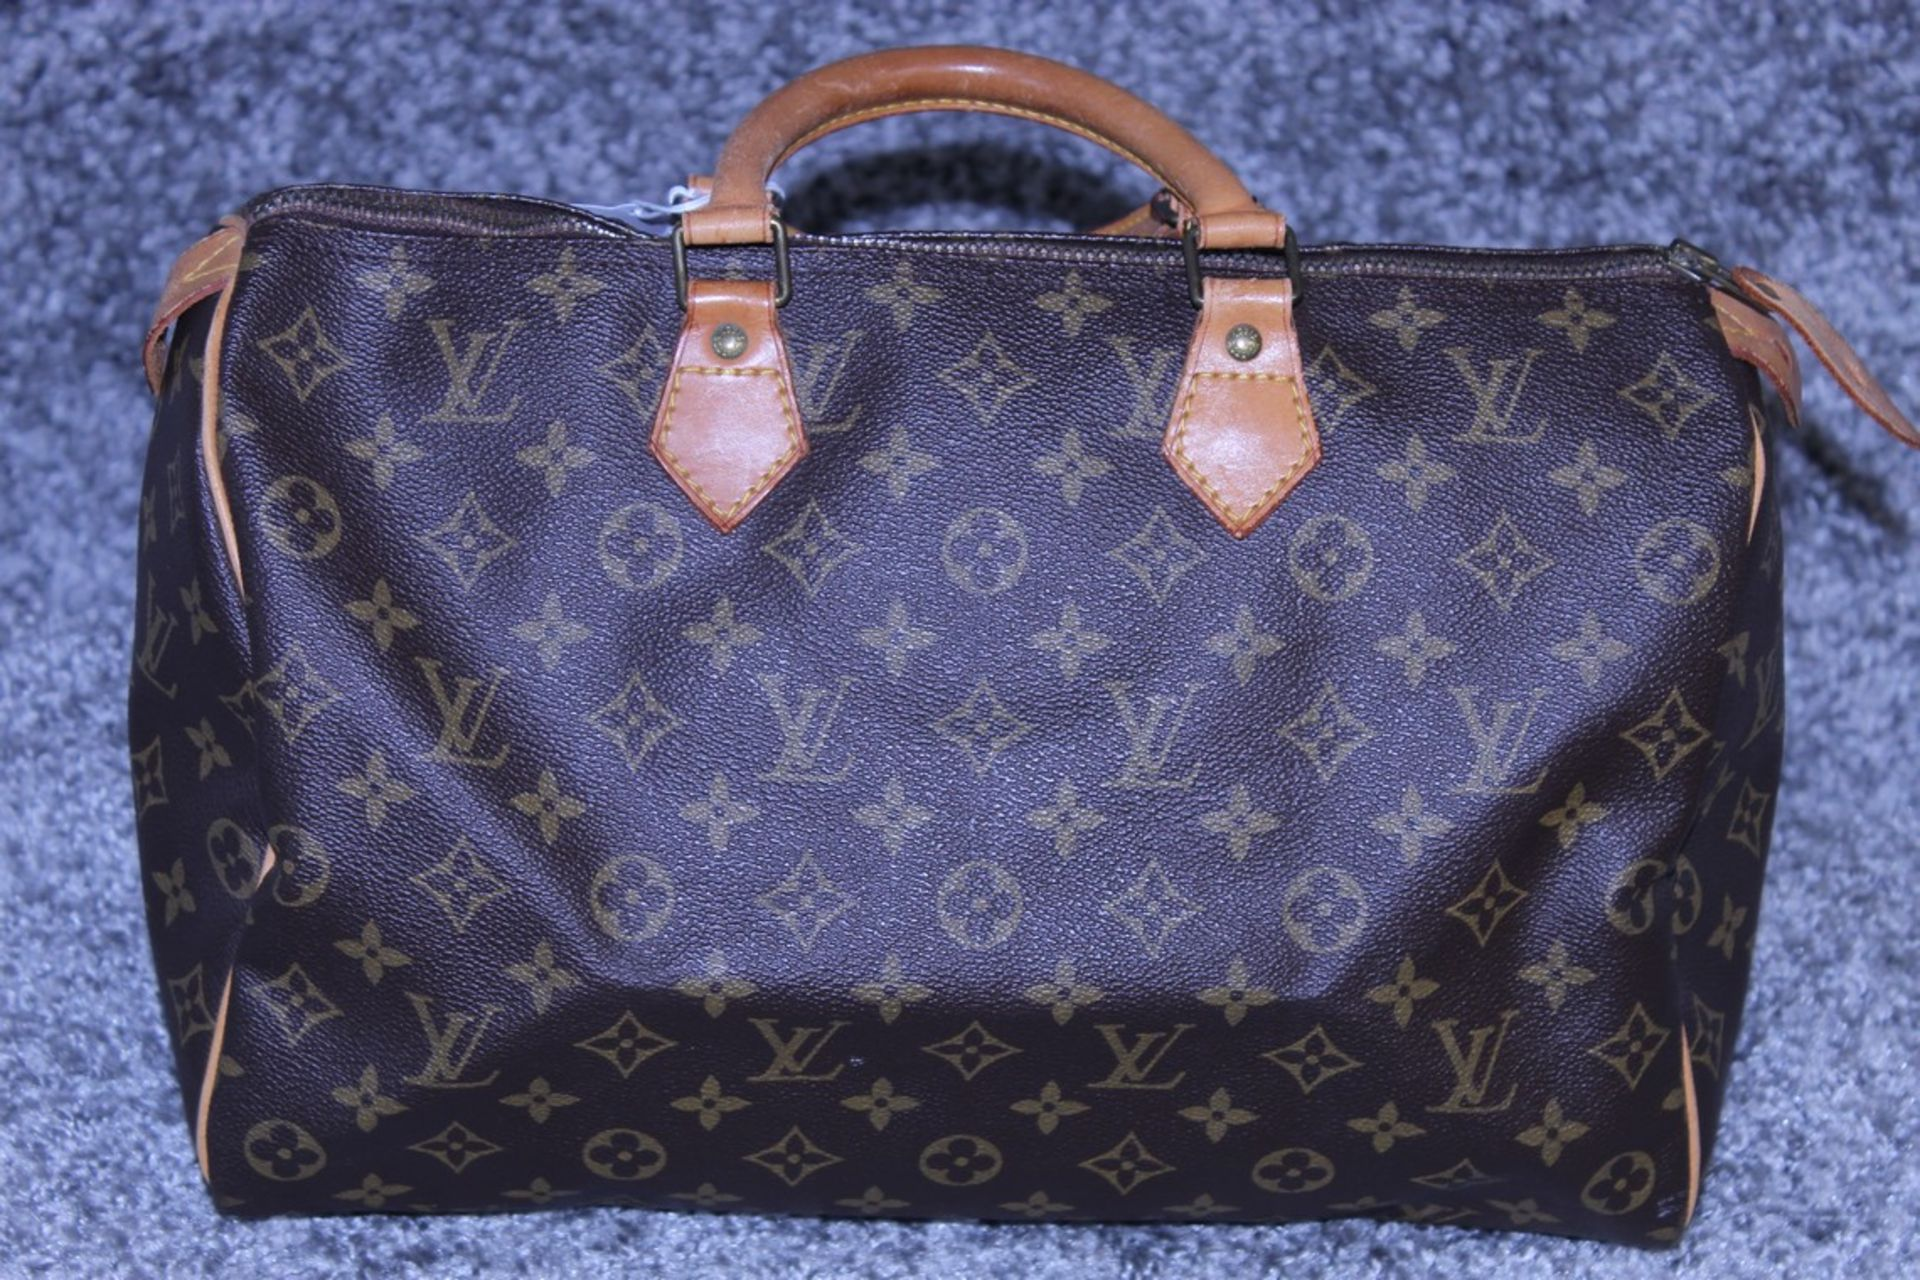 RRP £1100 Louis Vuitton Speedy Brown Coated Monogram Canvas Handbag With Vachetta Handles ( - Image 2 of 4